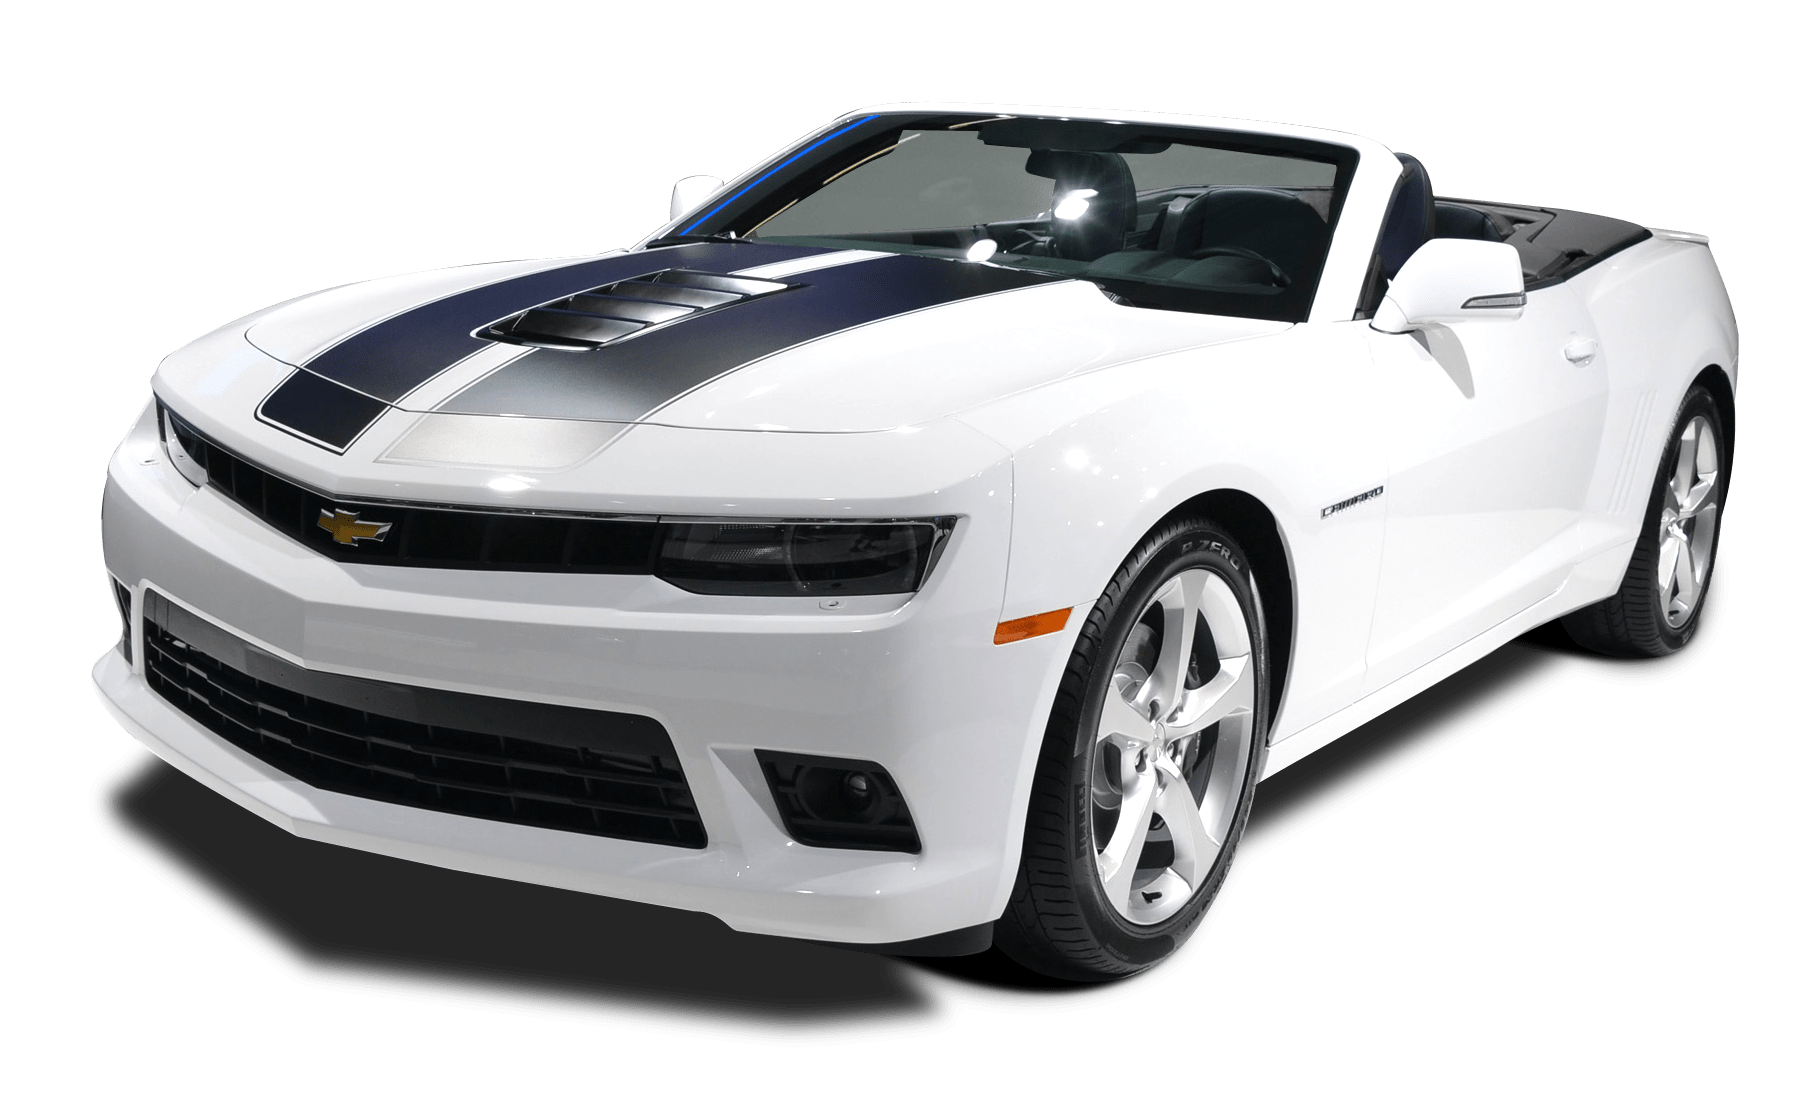 Lamborgini Sports Car Hd Wallpaper Chevrolet Cars Png Images Free Download